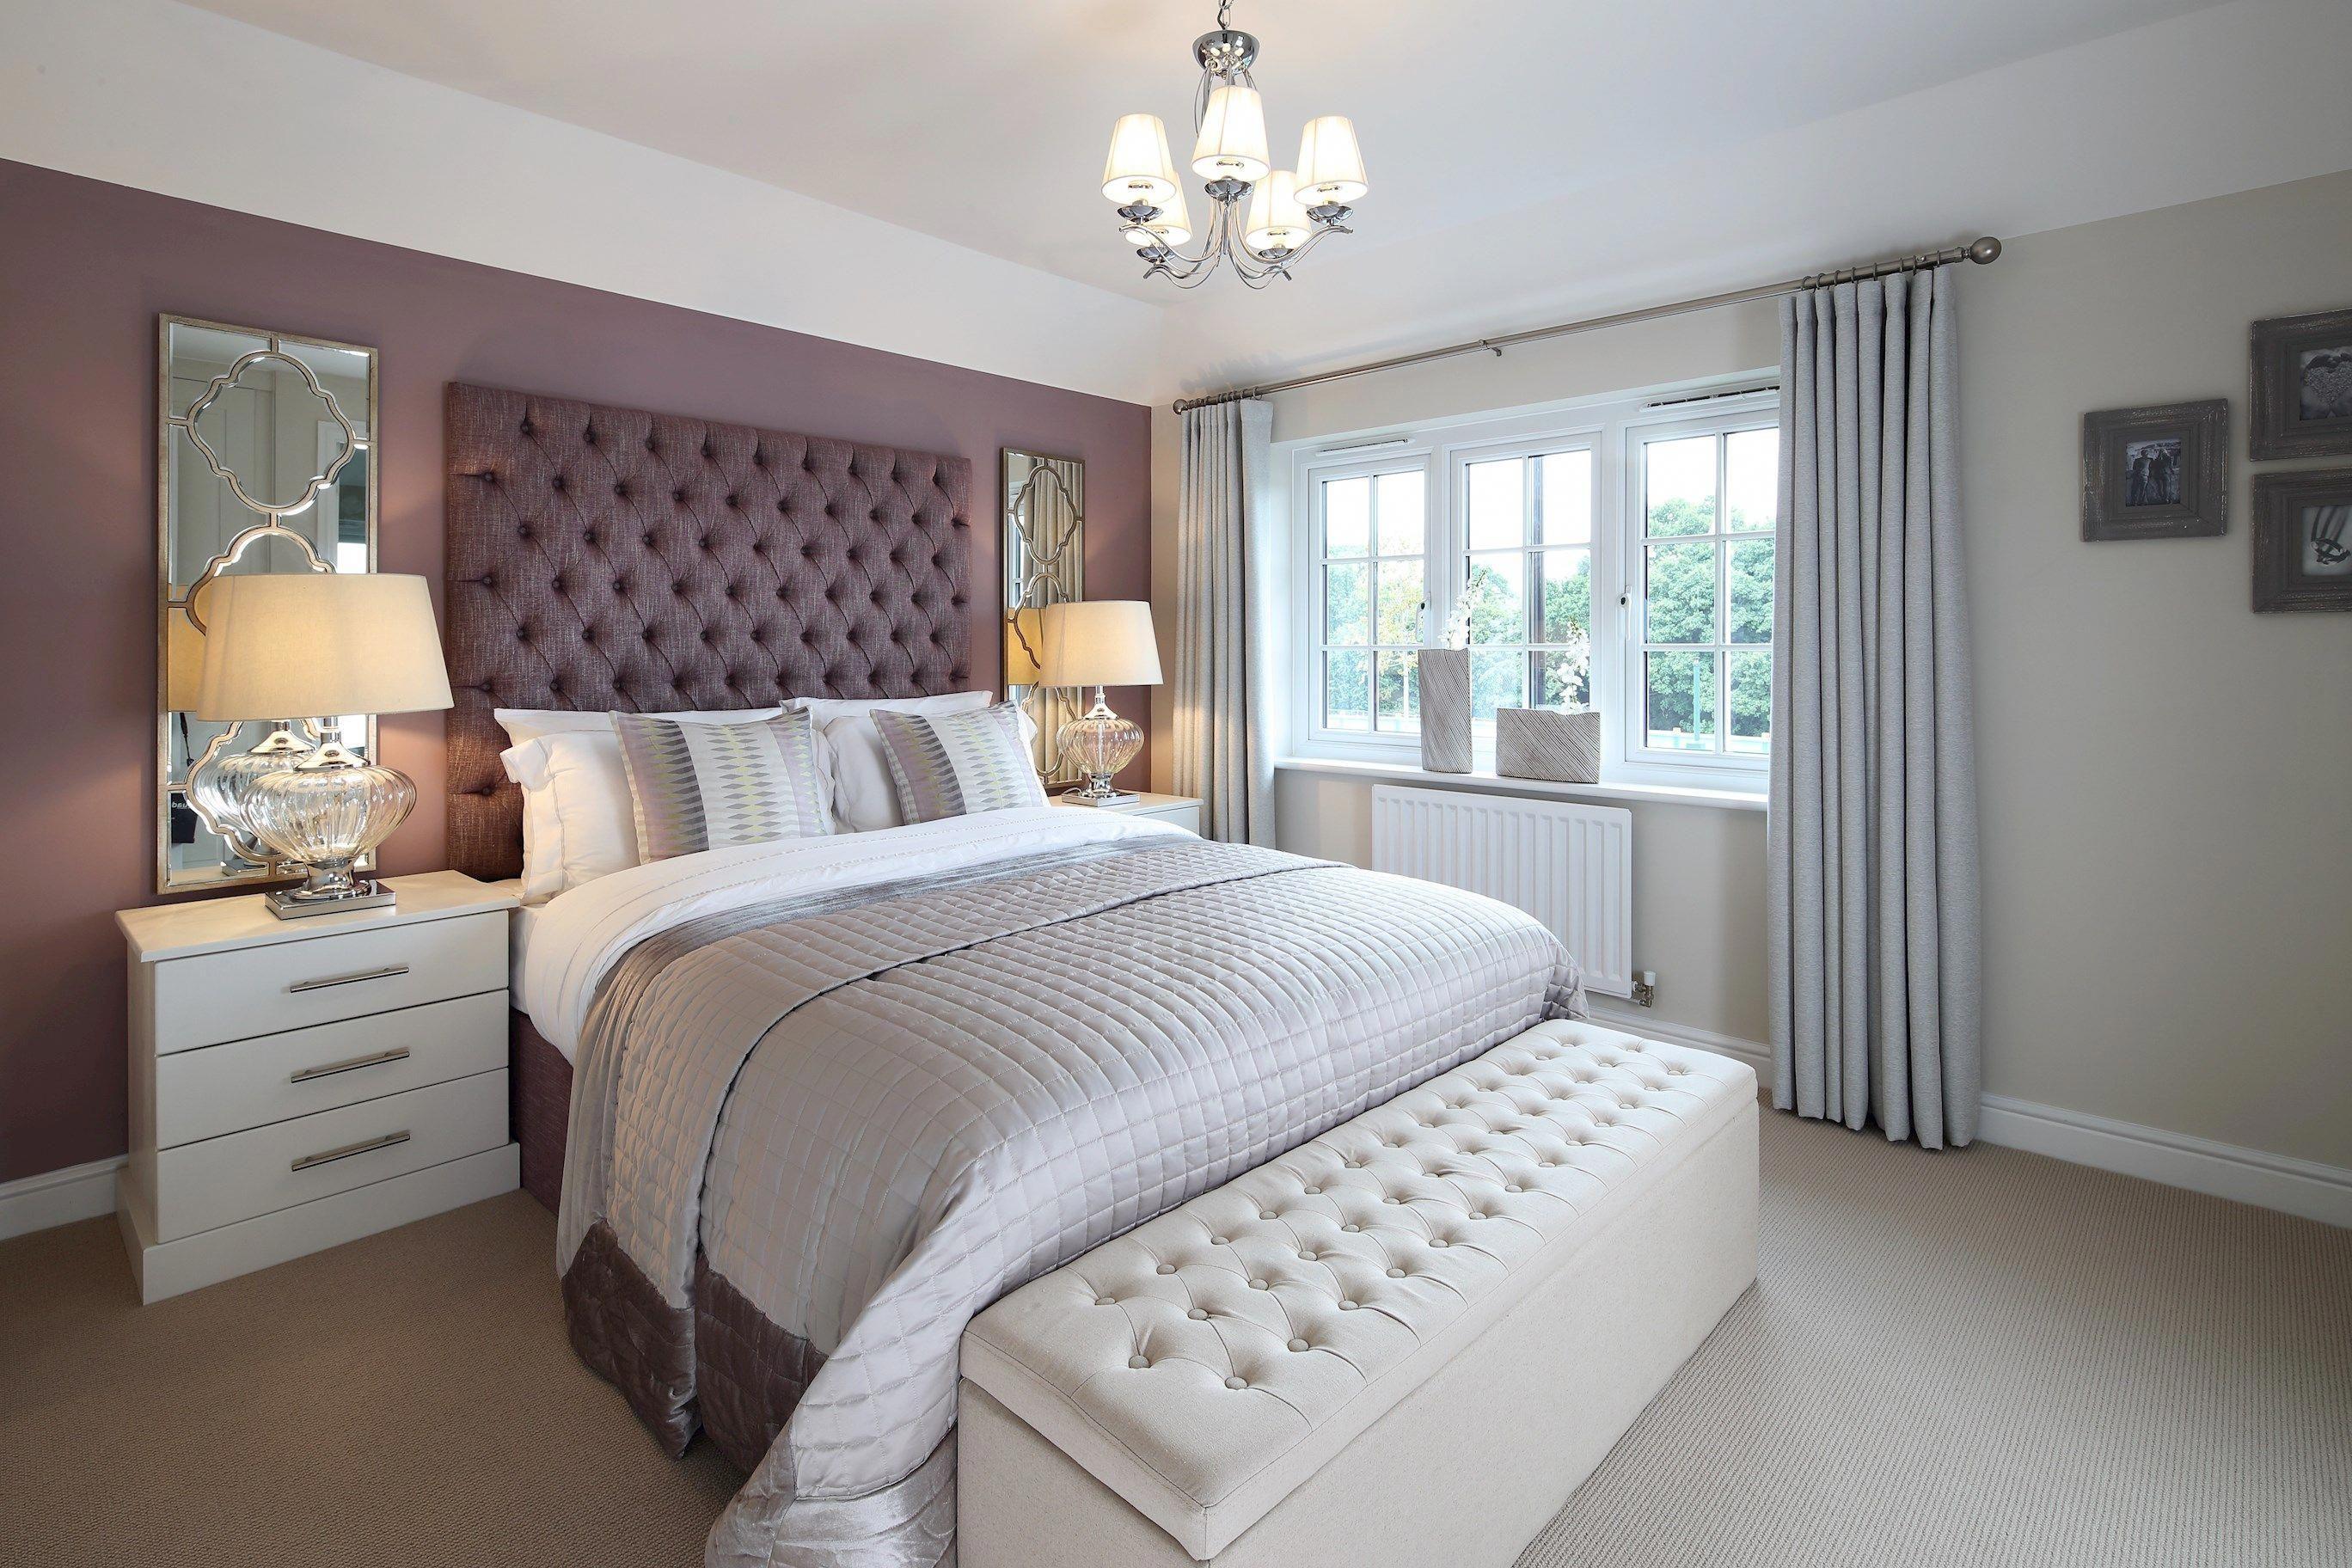 Dusky Pink Bedroom Walls